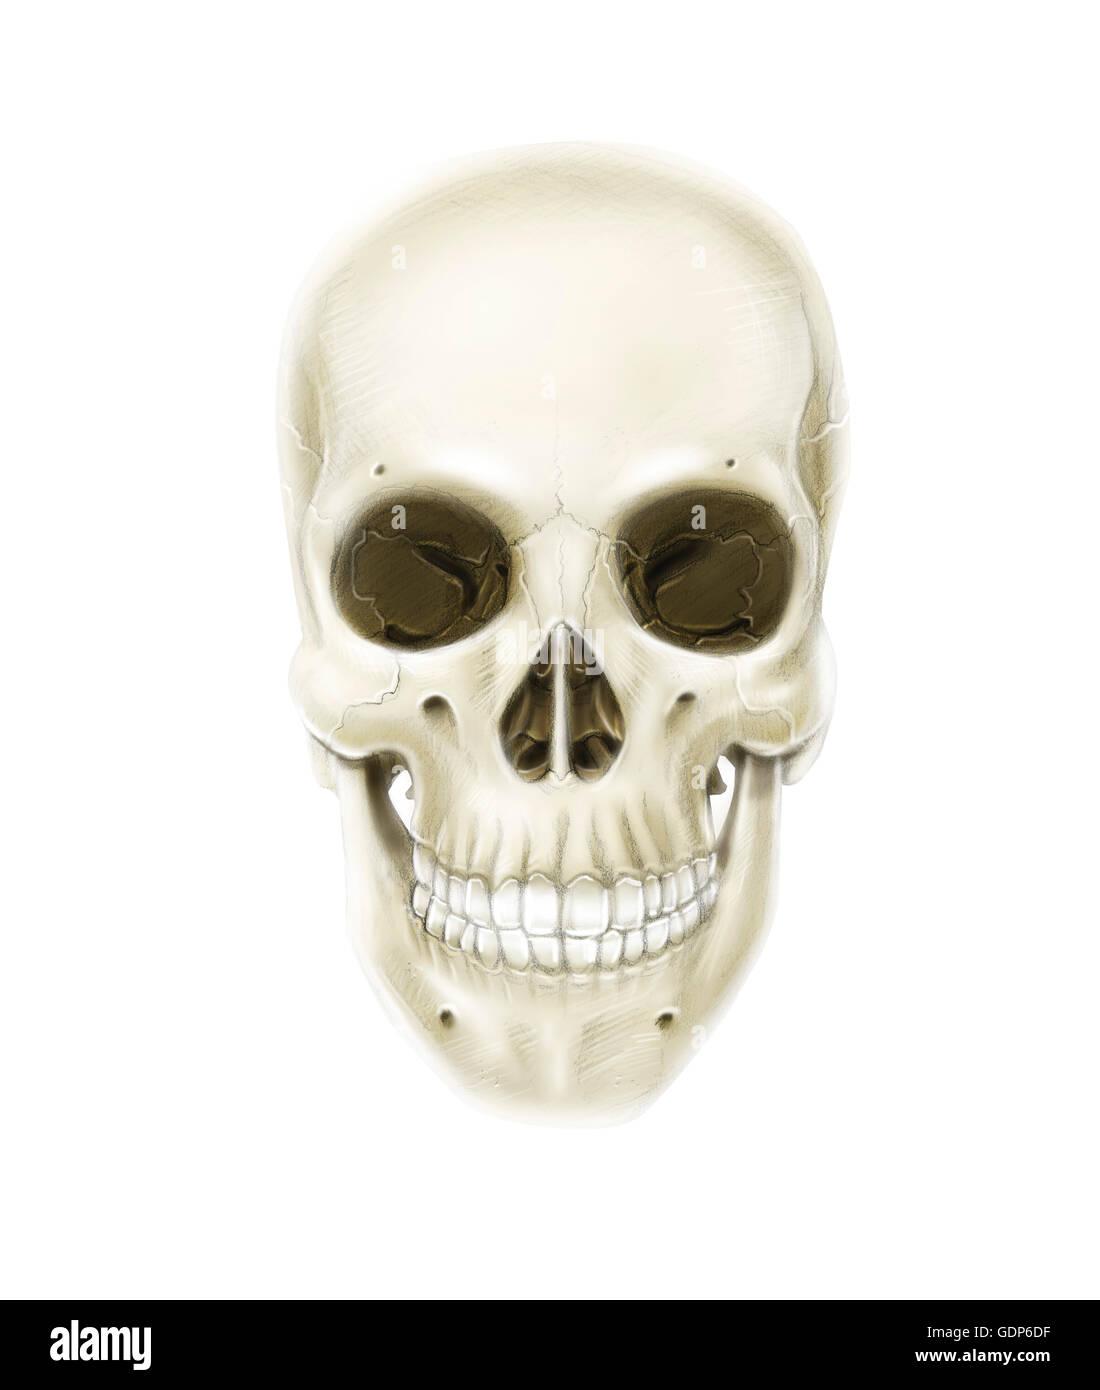 Anterior view of human skull. - Stock Image